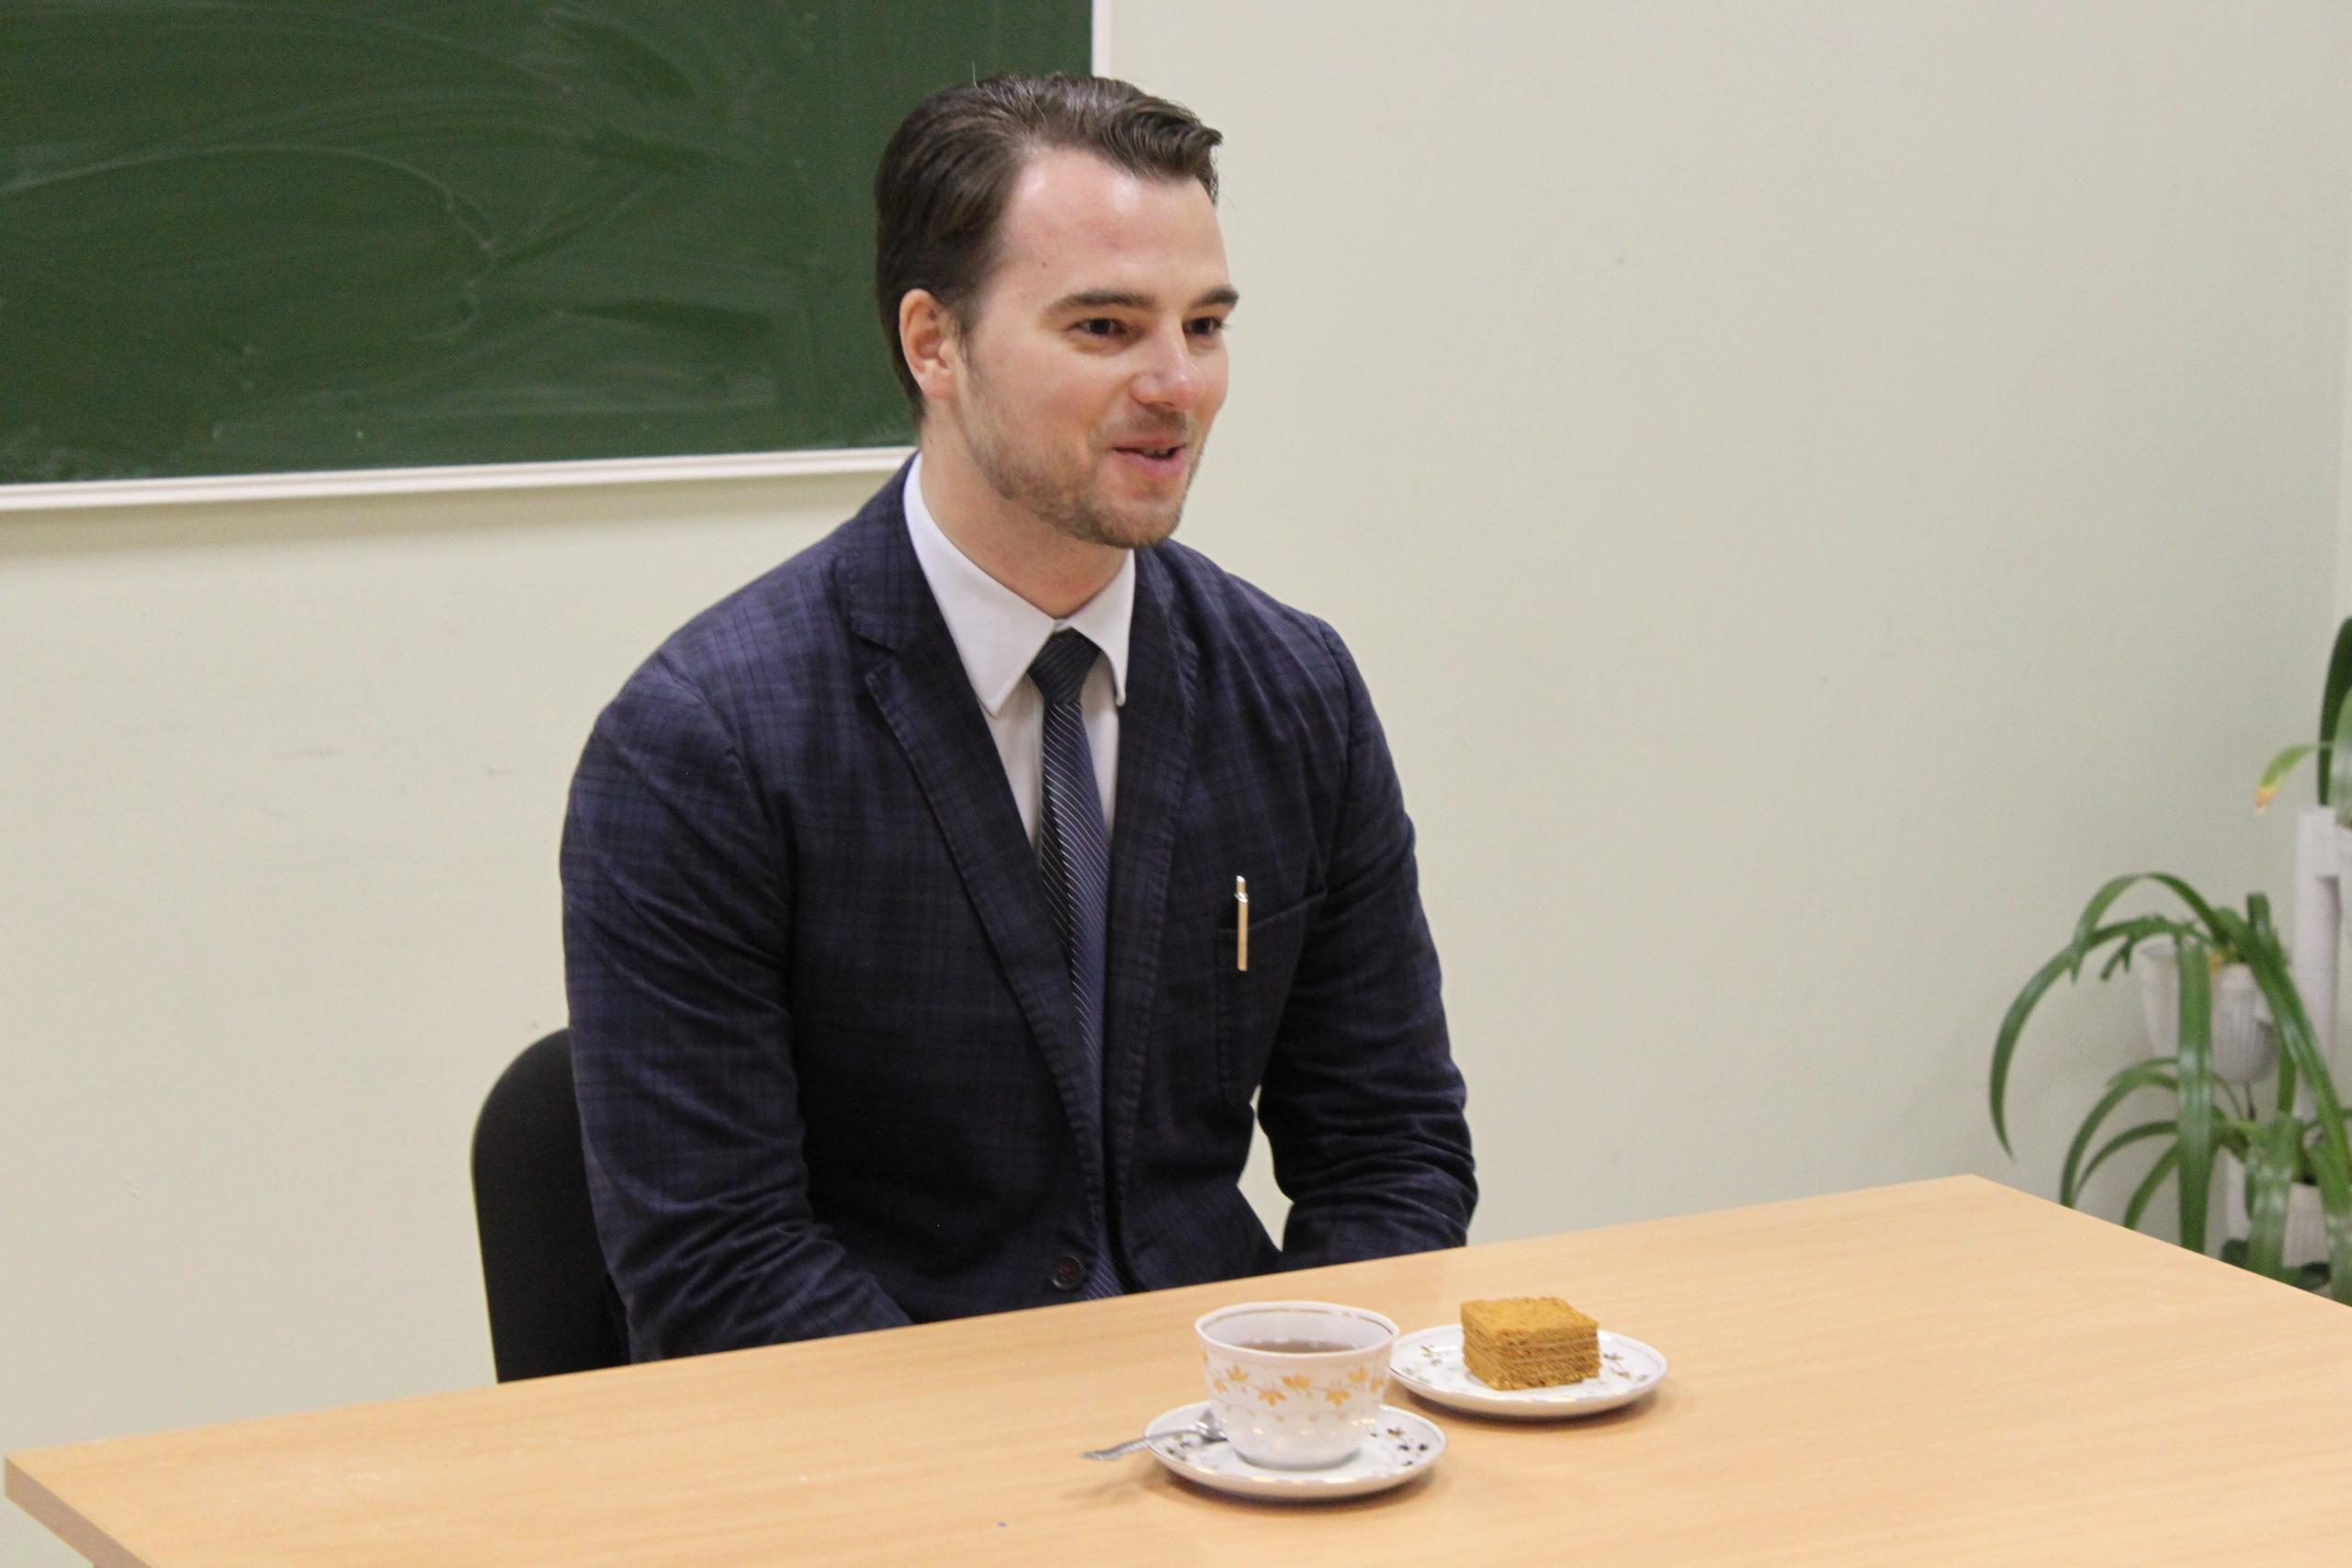 Журналист телеканала «Союз» Тимофей Обухов